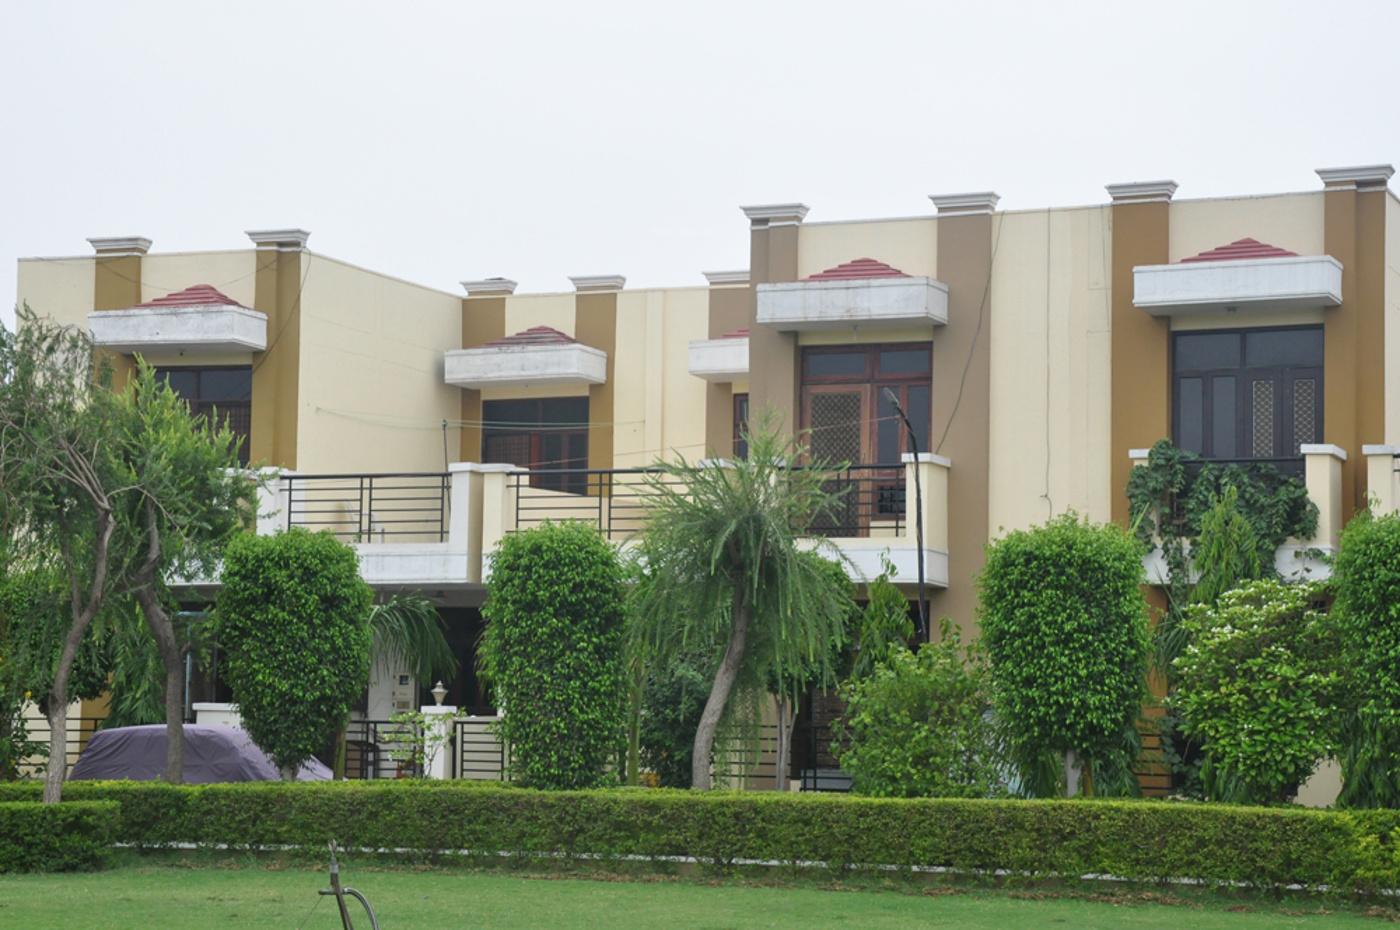 990 Sq Ft 3 Bhk 3t Villa For Sale In Nikhil Garden Phase 2